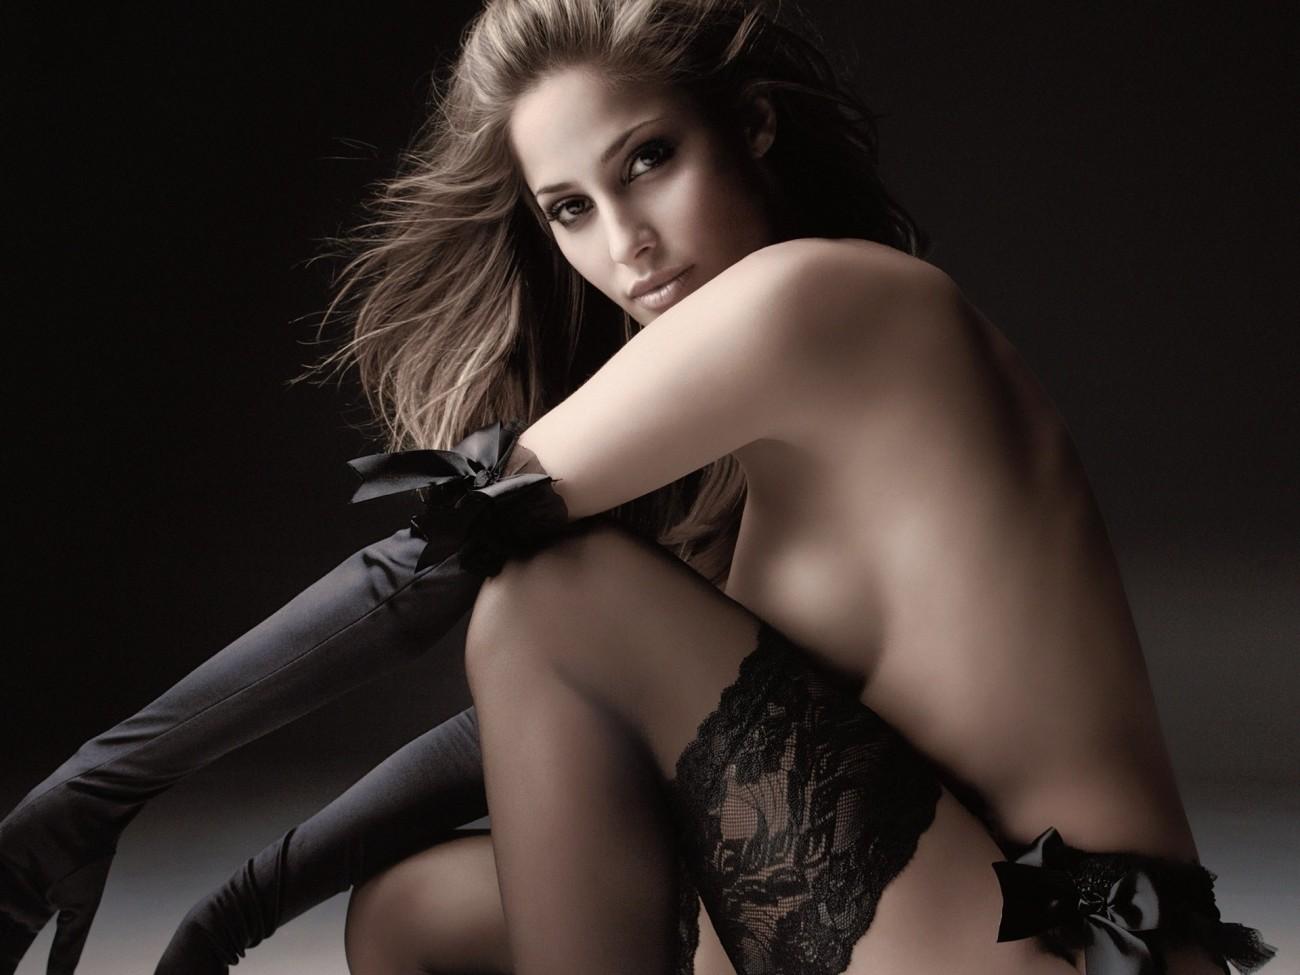 Kim kardashian lounges around in sexy lingerie in behind